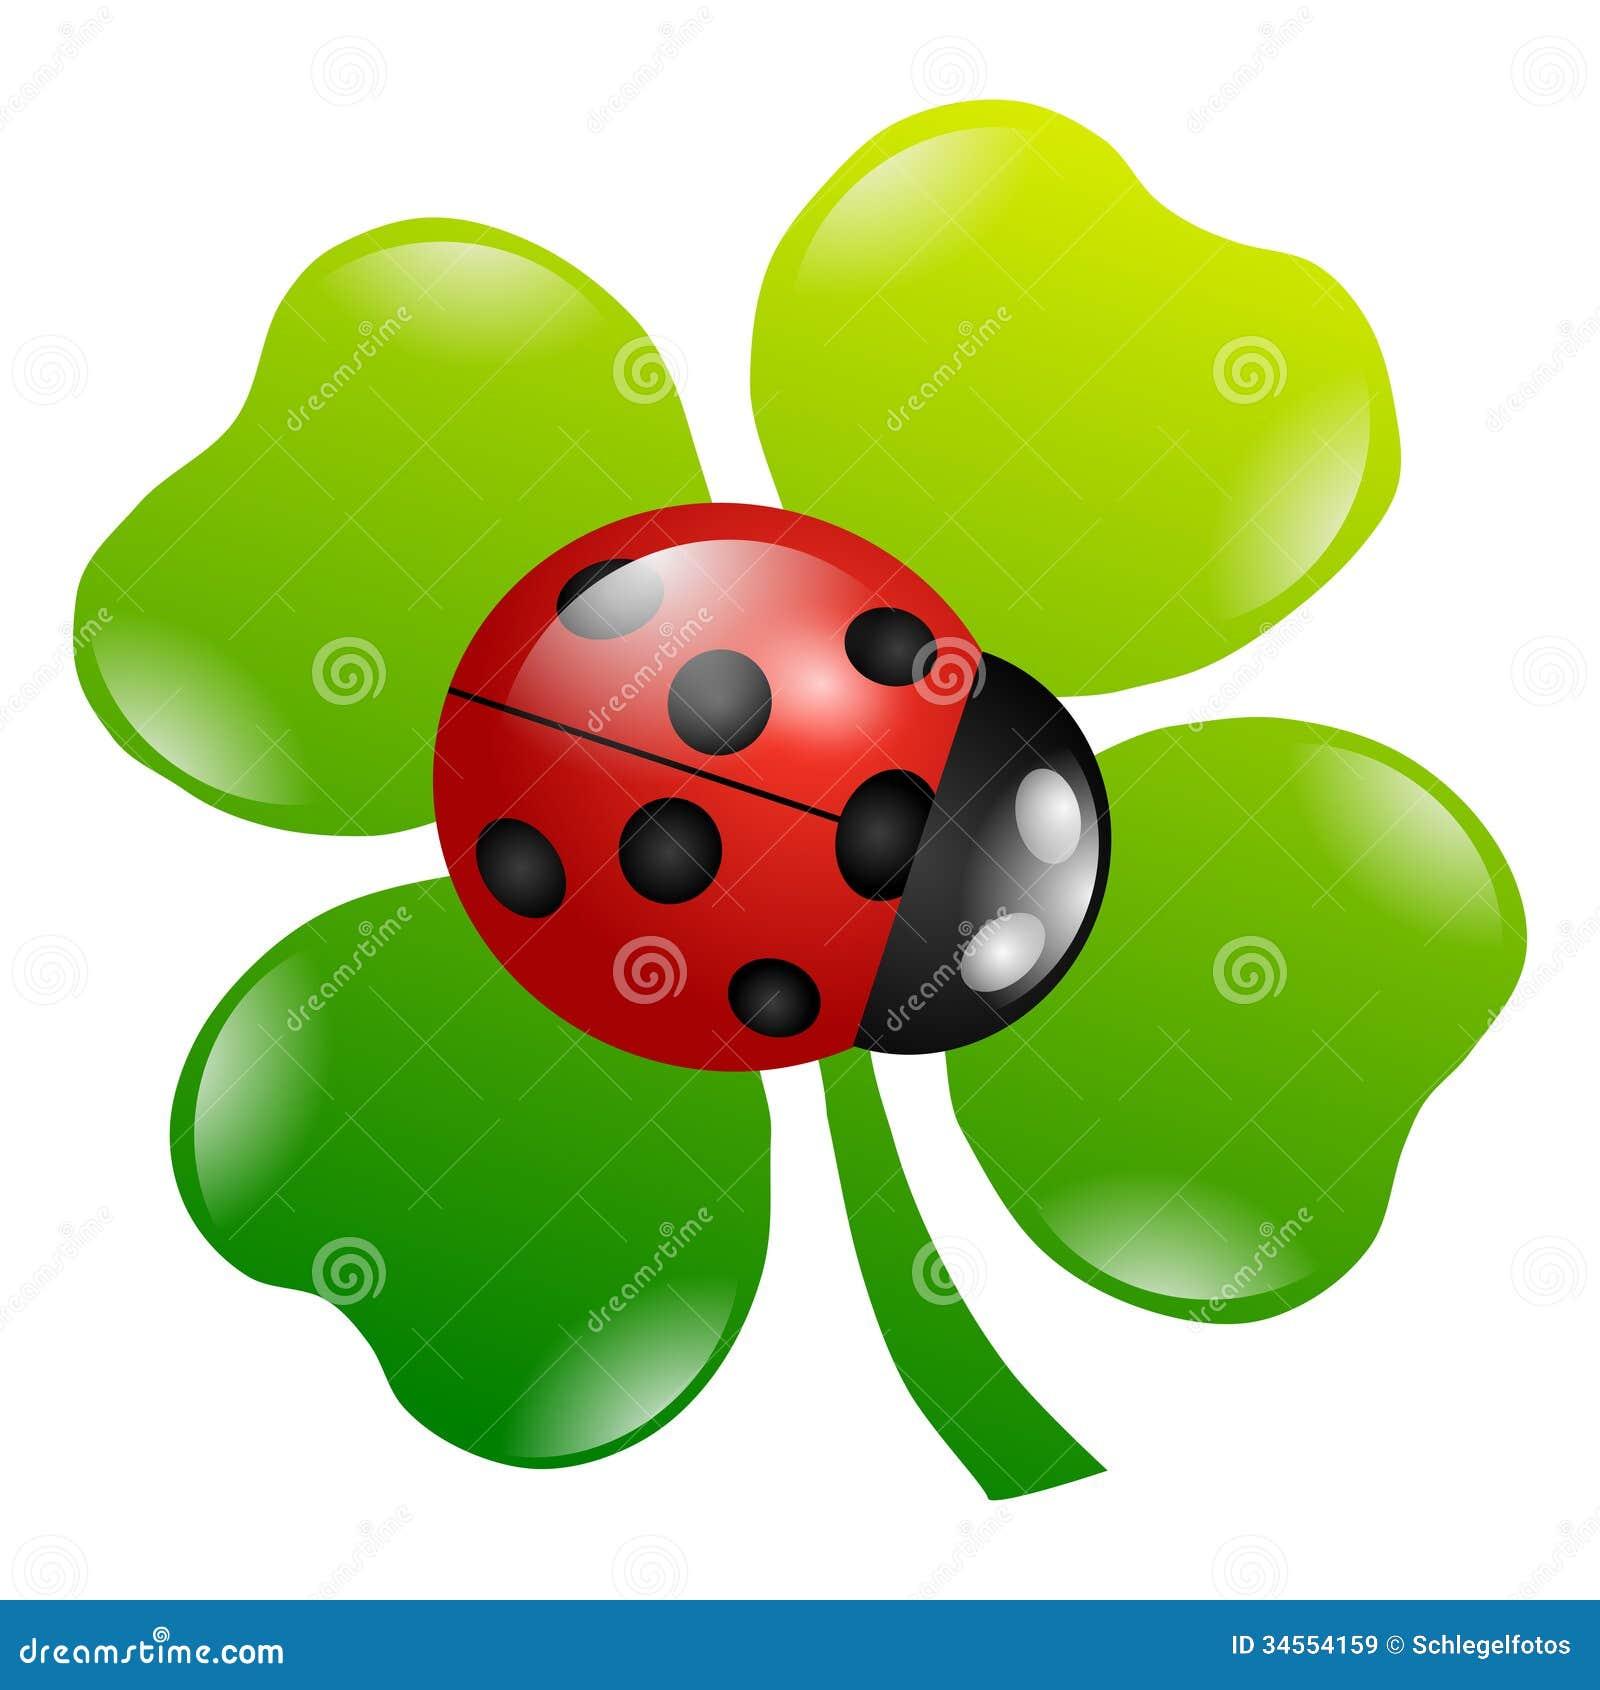 ein grünes kleeblatt lizenzfreie stockbilder  bild 34554159